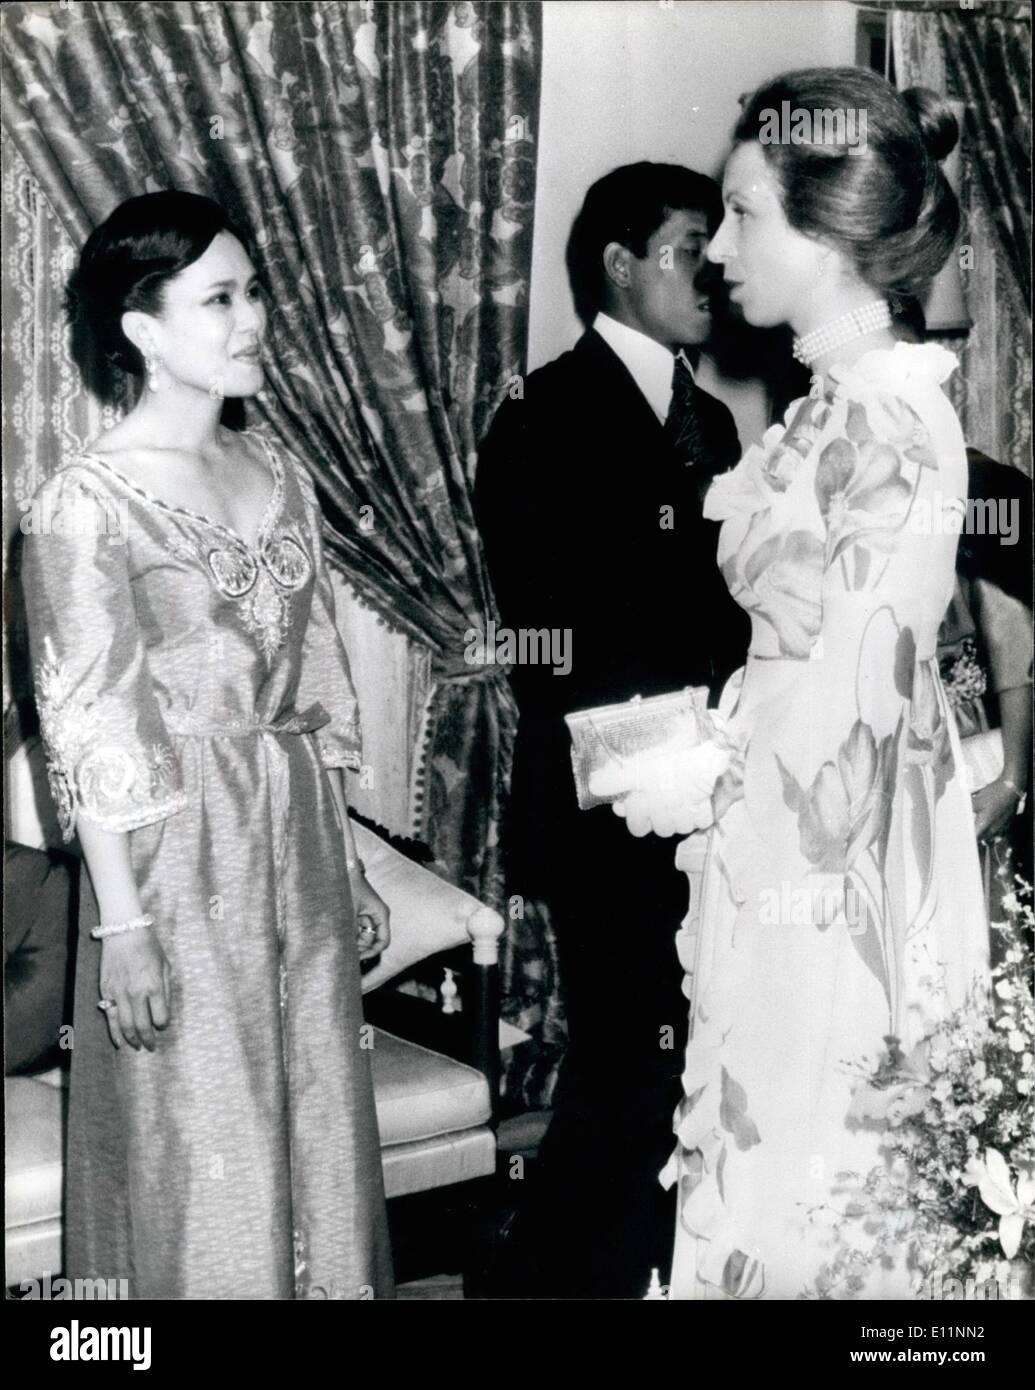 Husband Princess Anne Stockfotos & Husband Princess Anne Bilder - Alamy